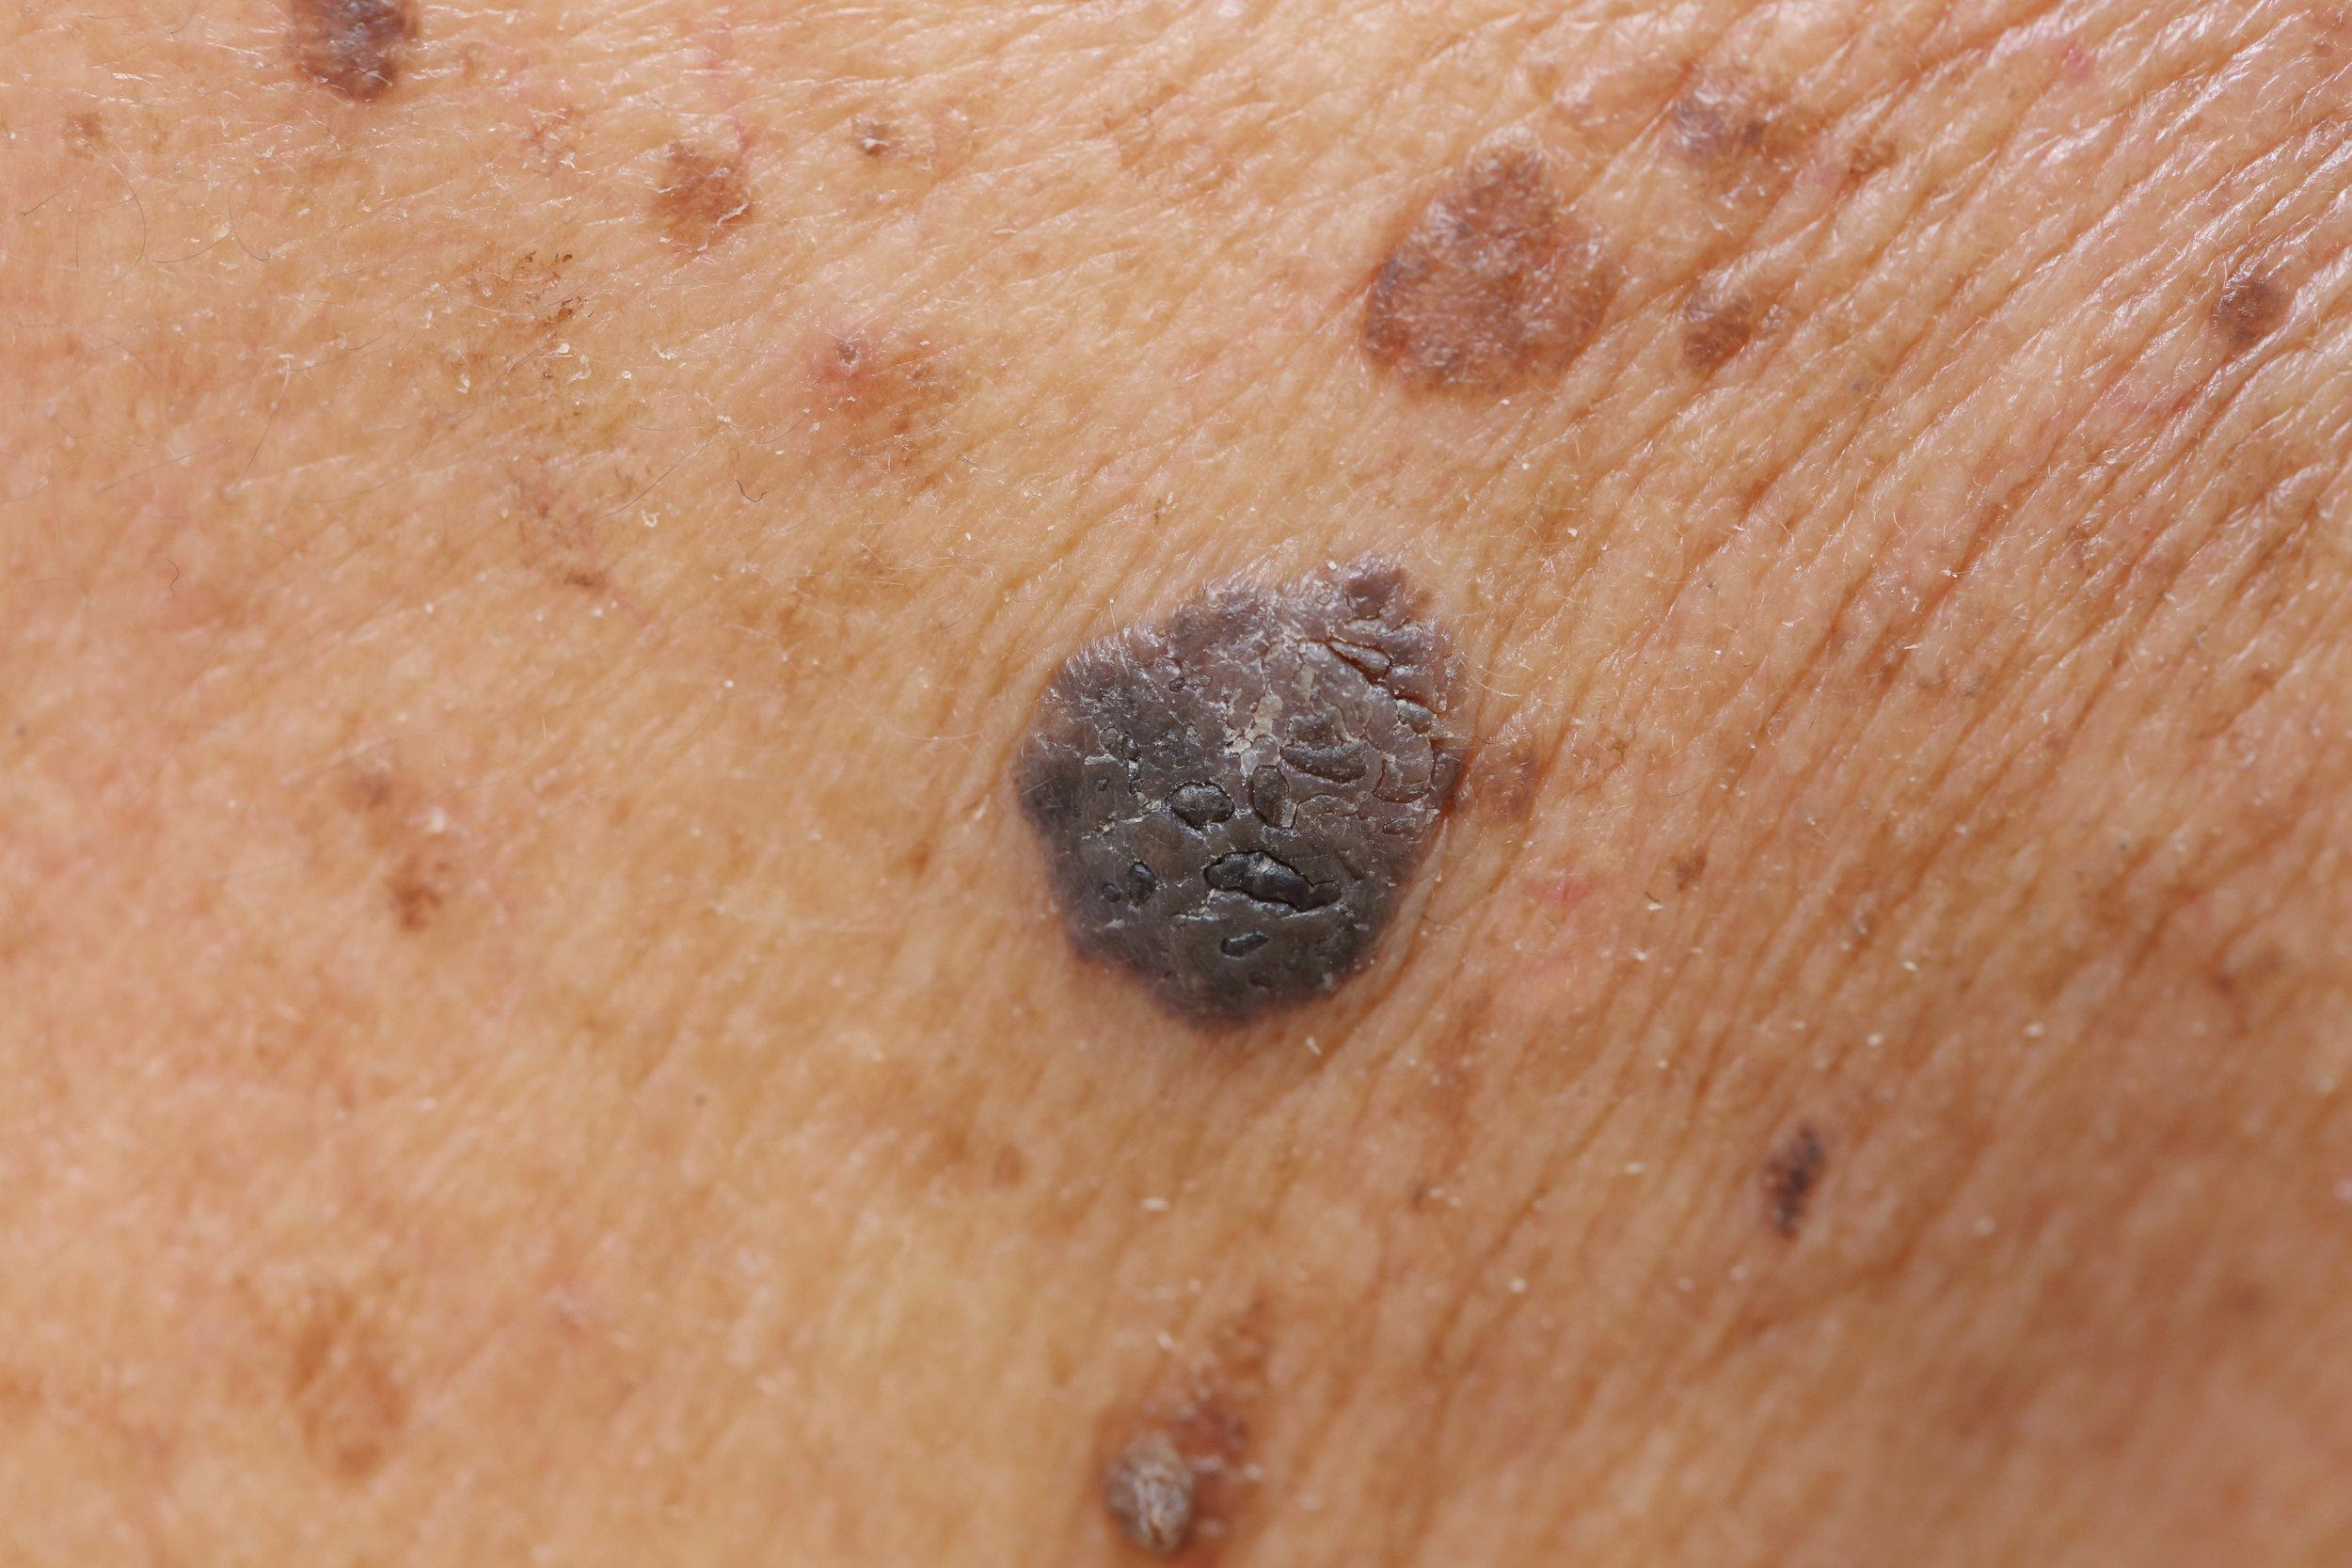 A close-up photo of a sebhorrheic keratosis on the skin